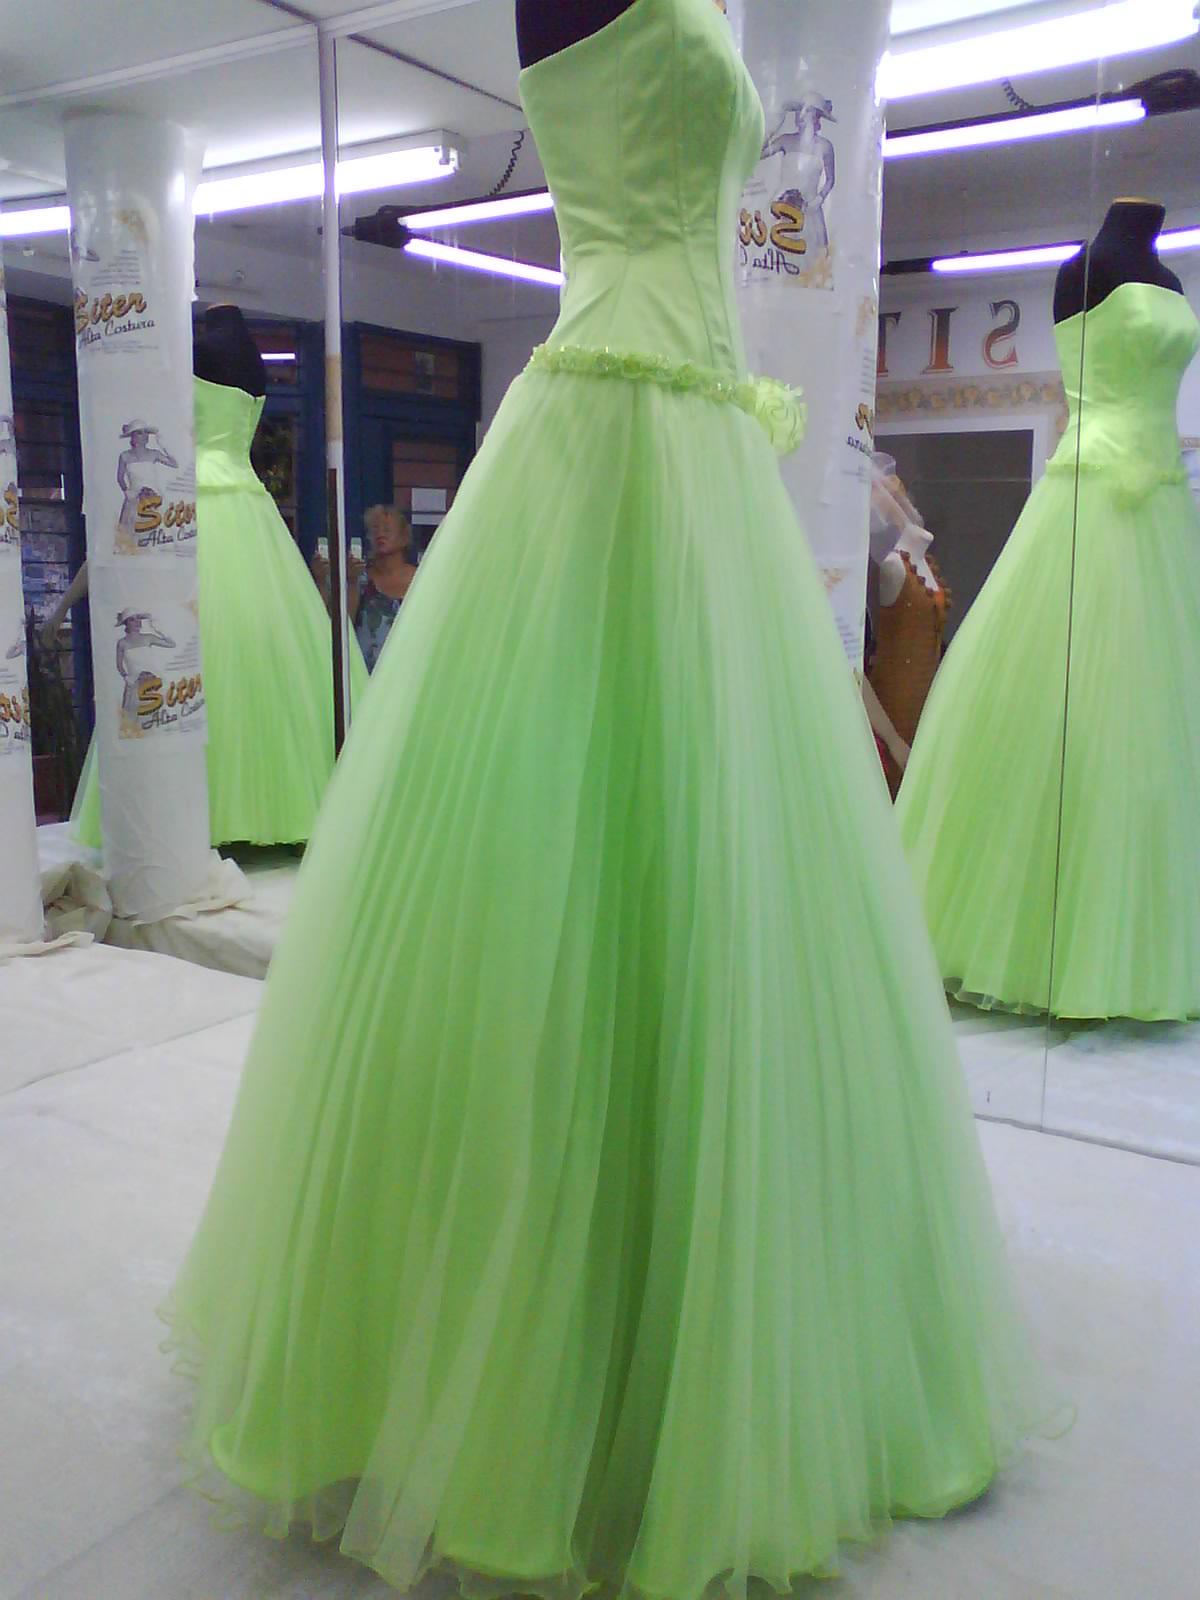 Alquiler de vestidos de fiesta posadas